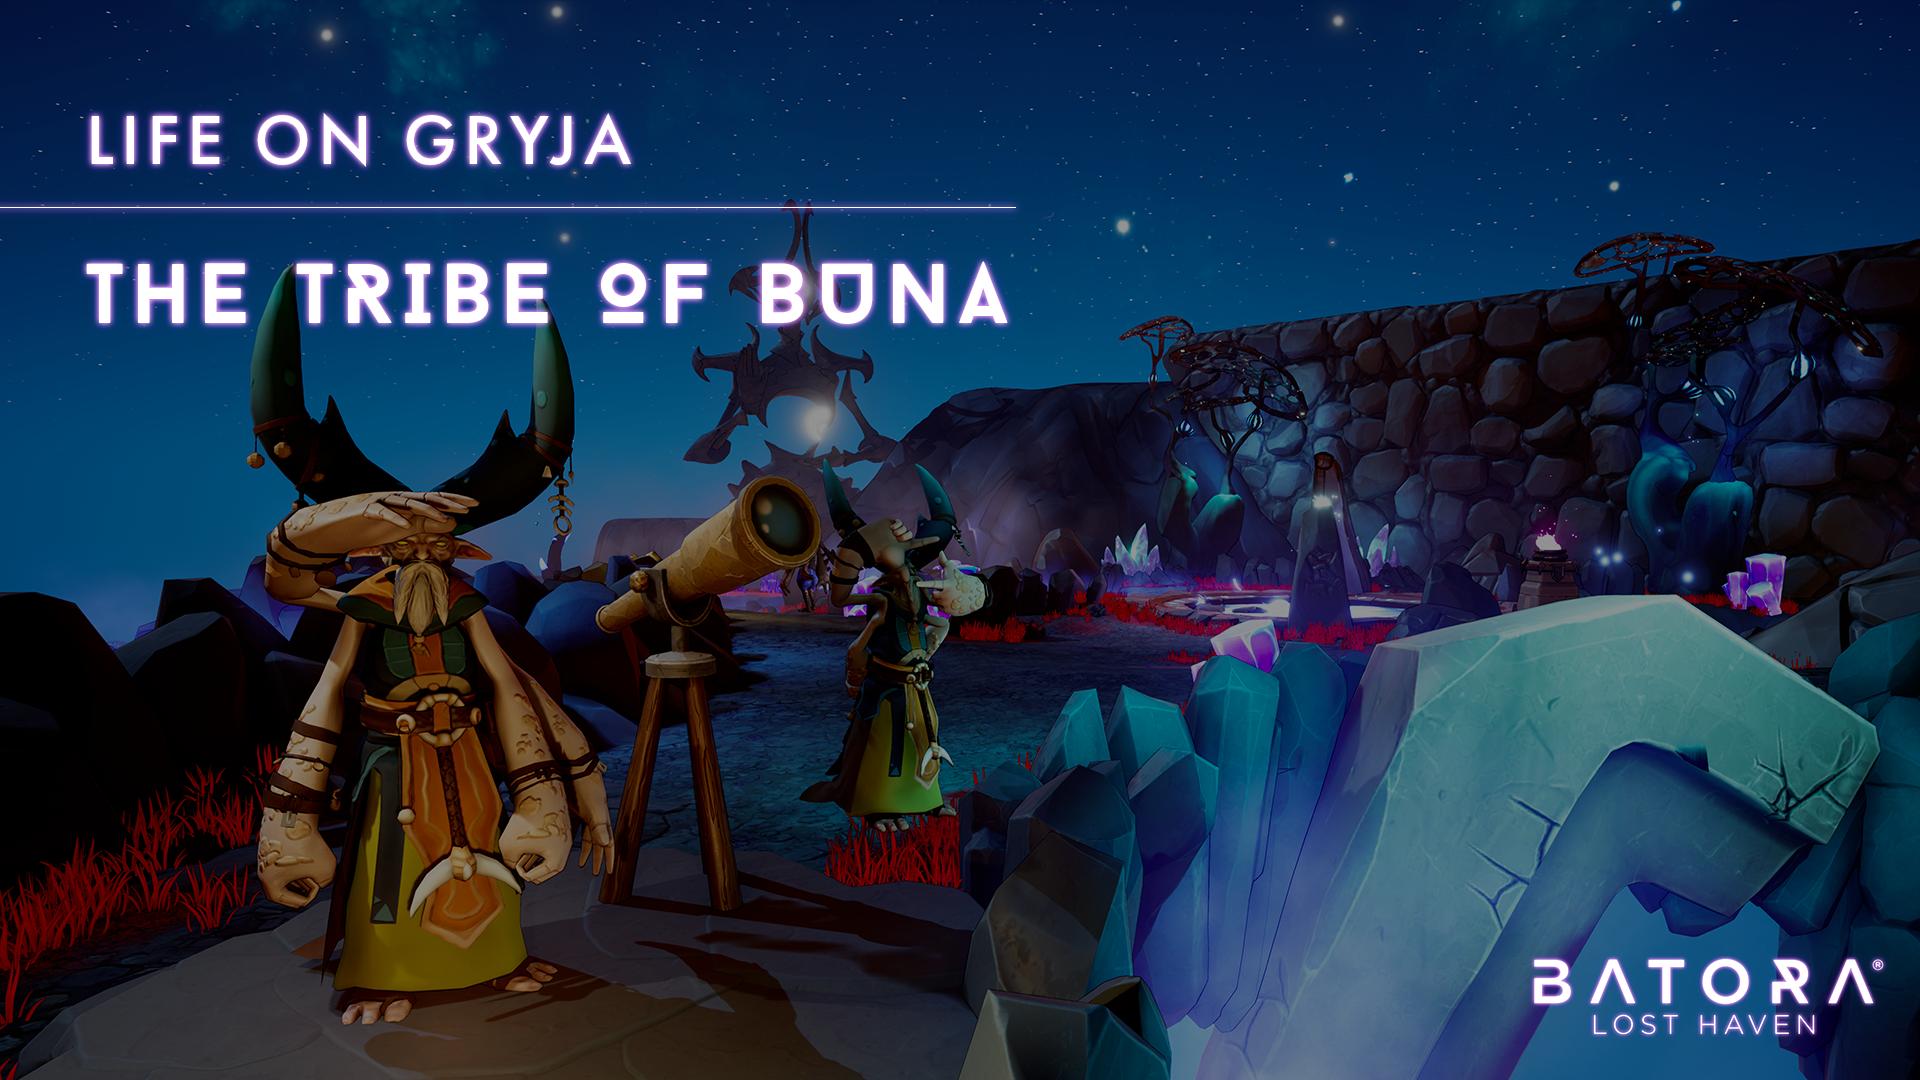 Life on Gryja: the tribe of Buna